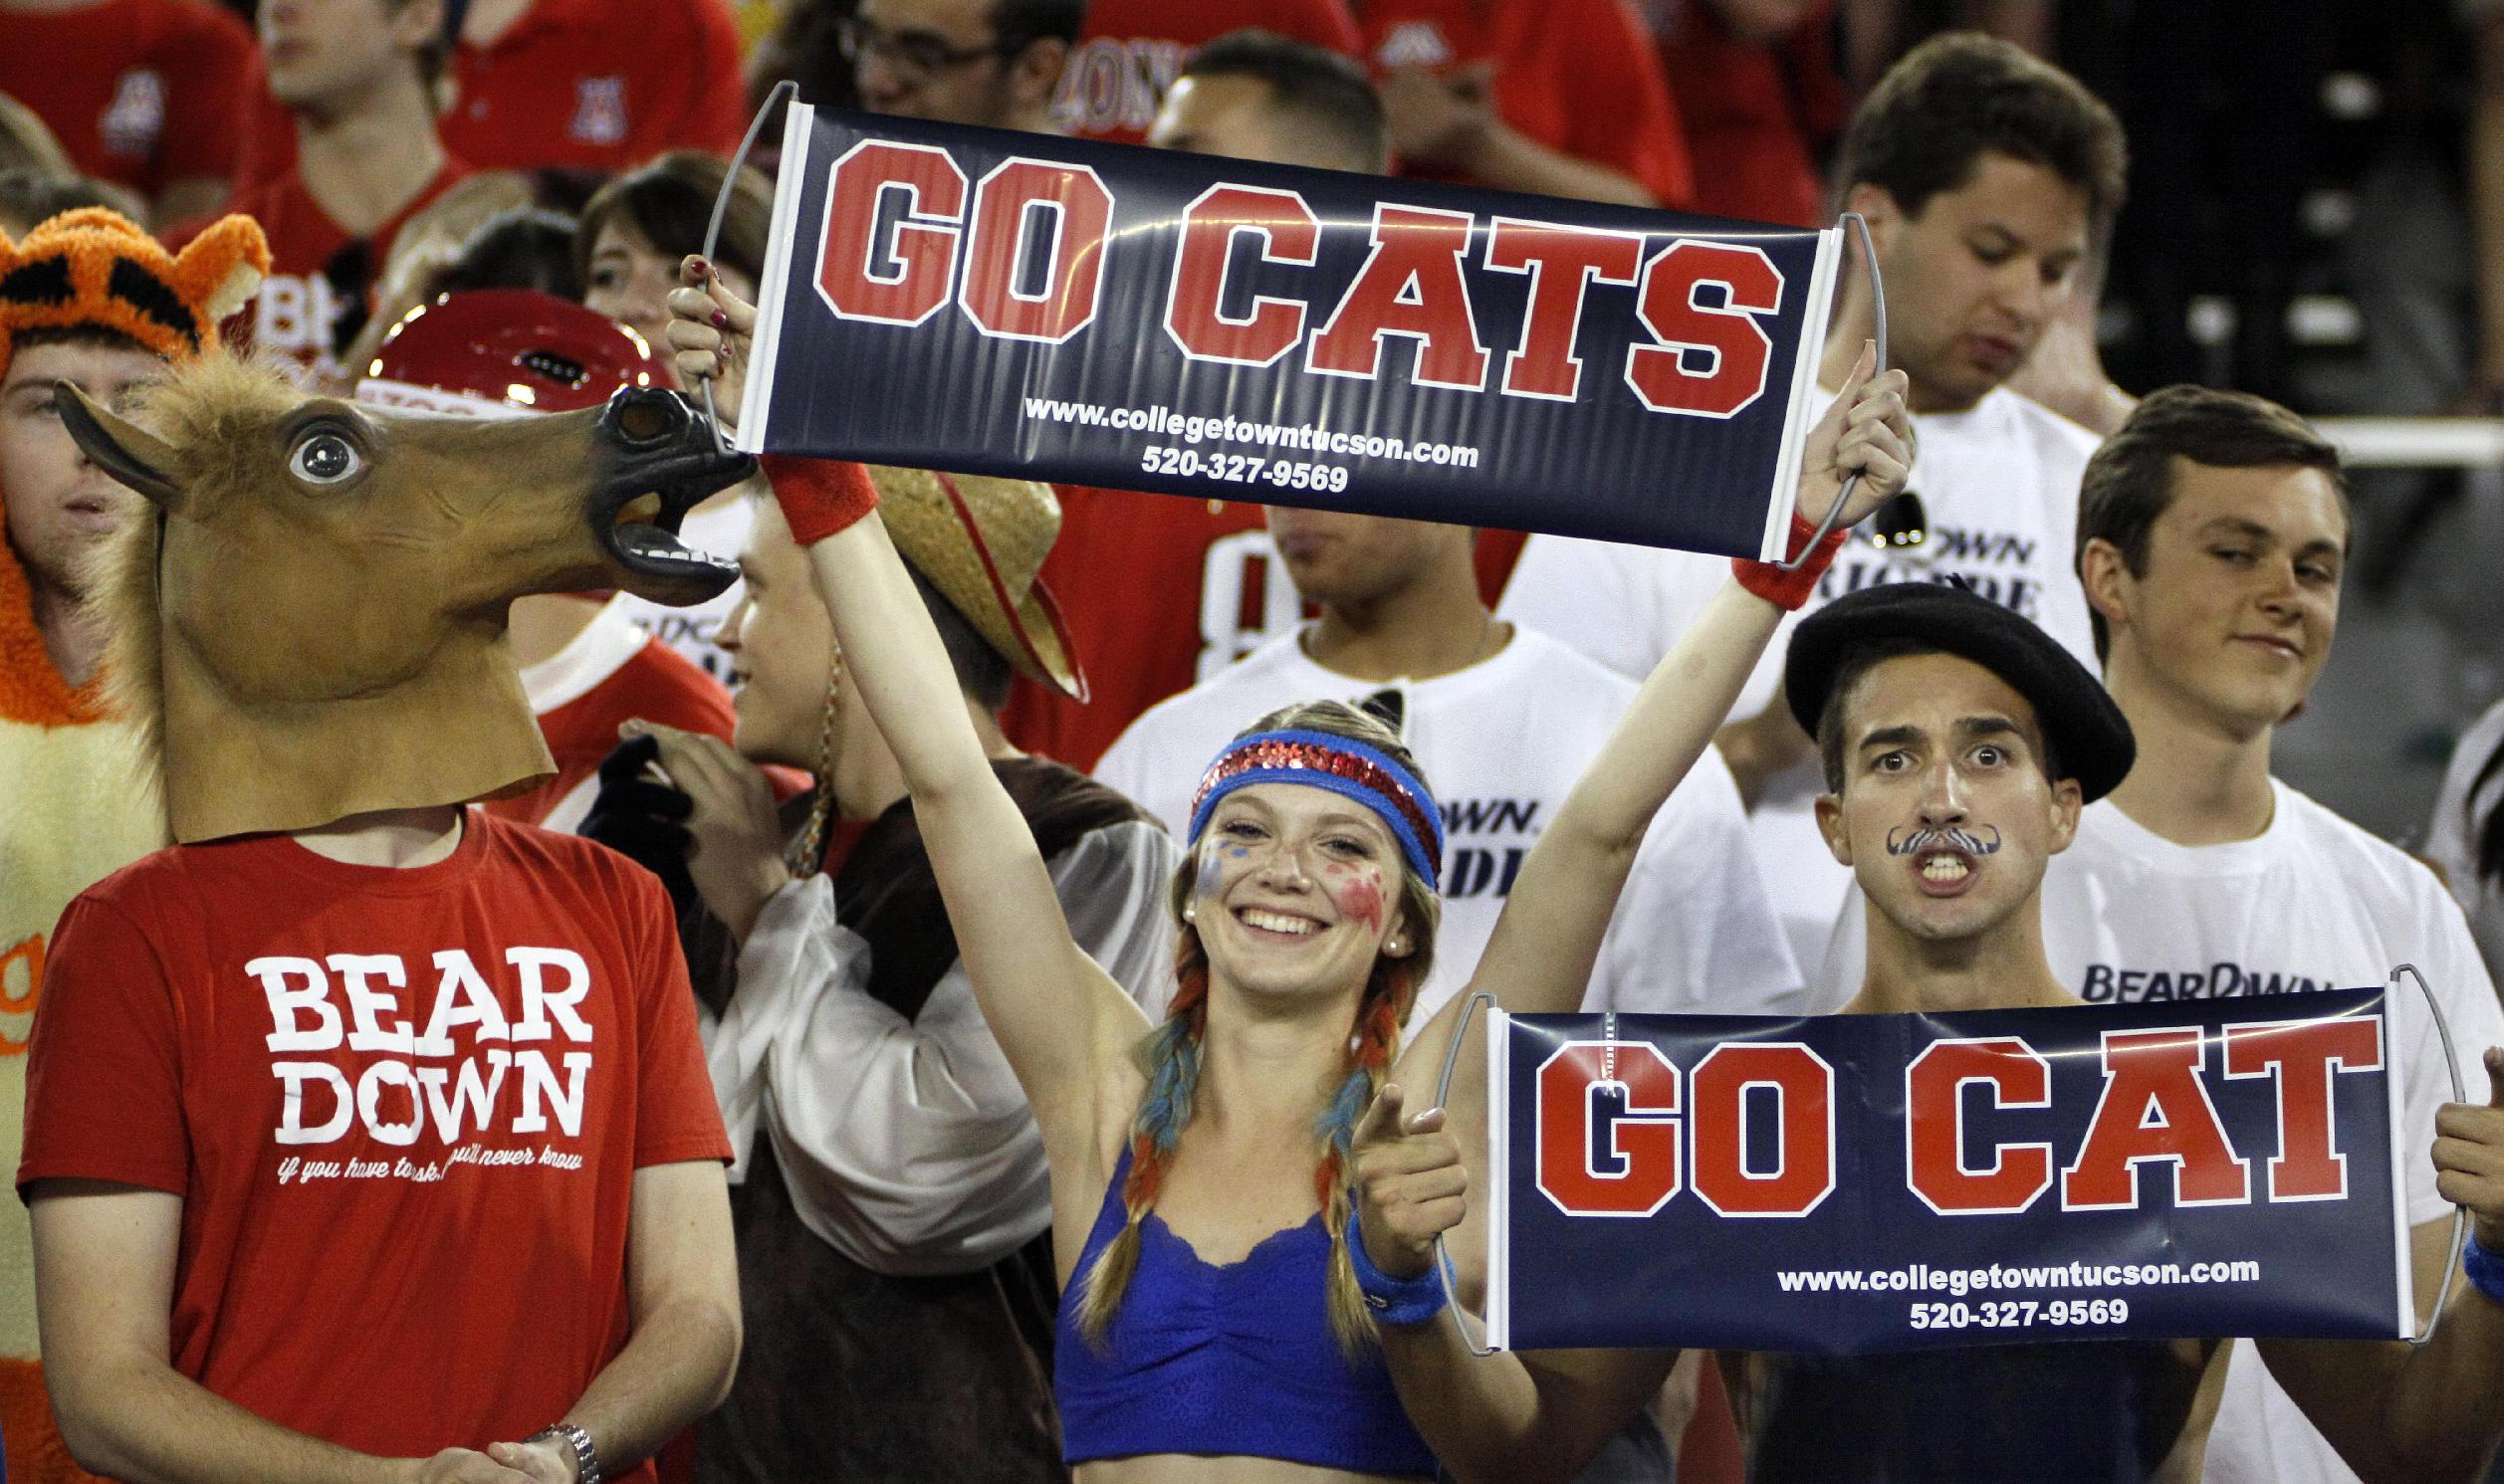 Arizona Wildcat fans show their spirit against Utah in the first half of an NCAA college football game, Saturday, Oct. 19, 2013 in Tucson, Ariz.  Arizona won 35 - 24